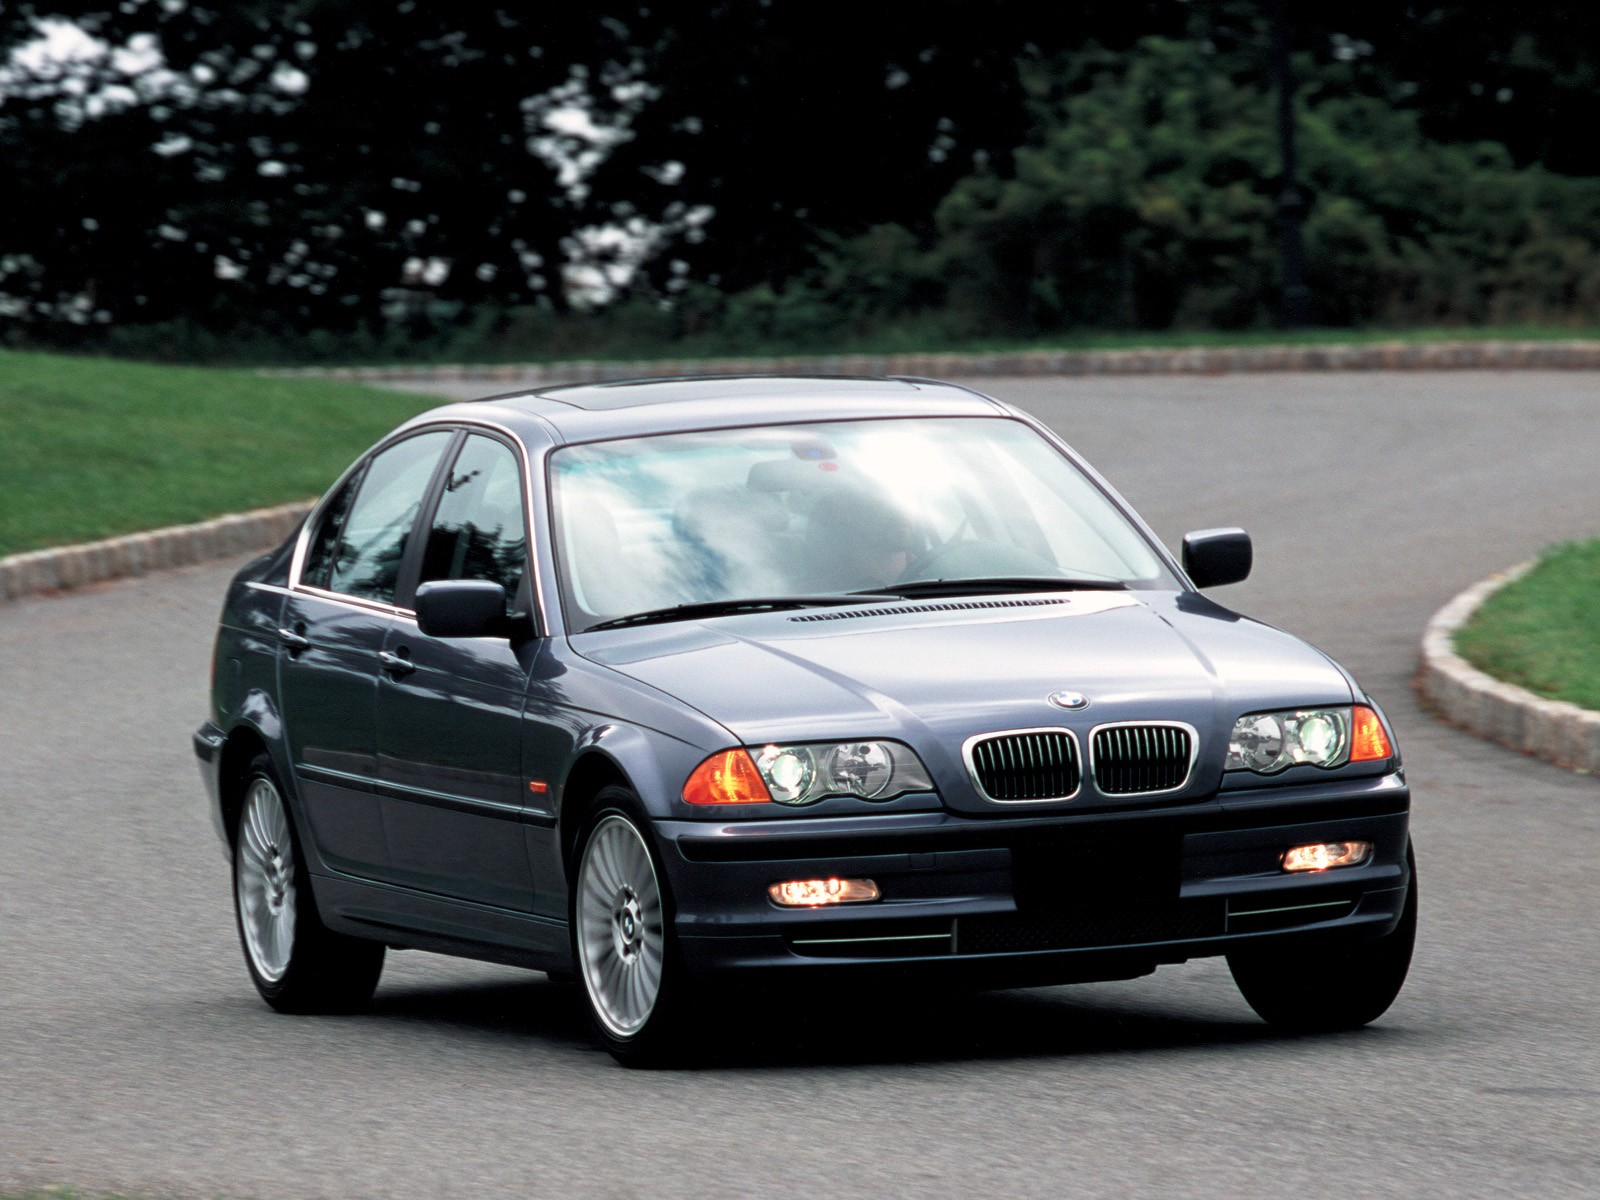 Bmw Series E on 1999 Bmw 323i